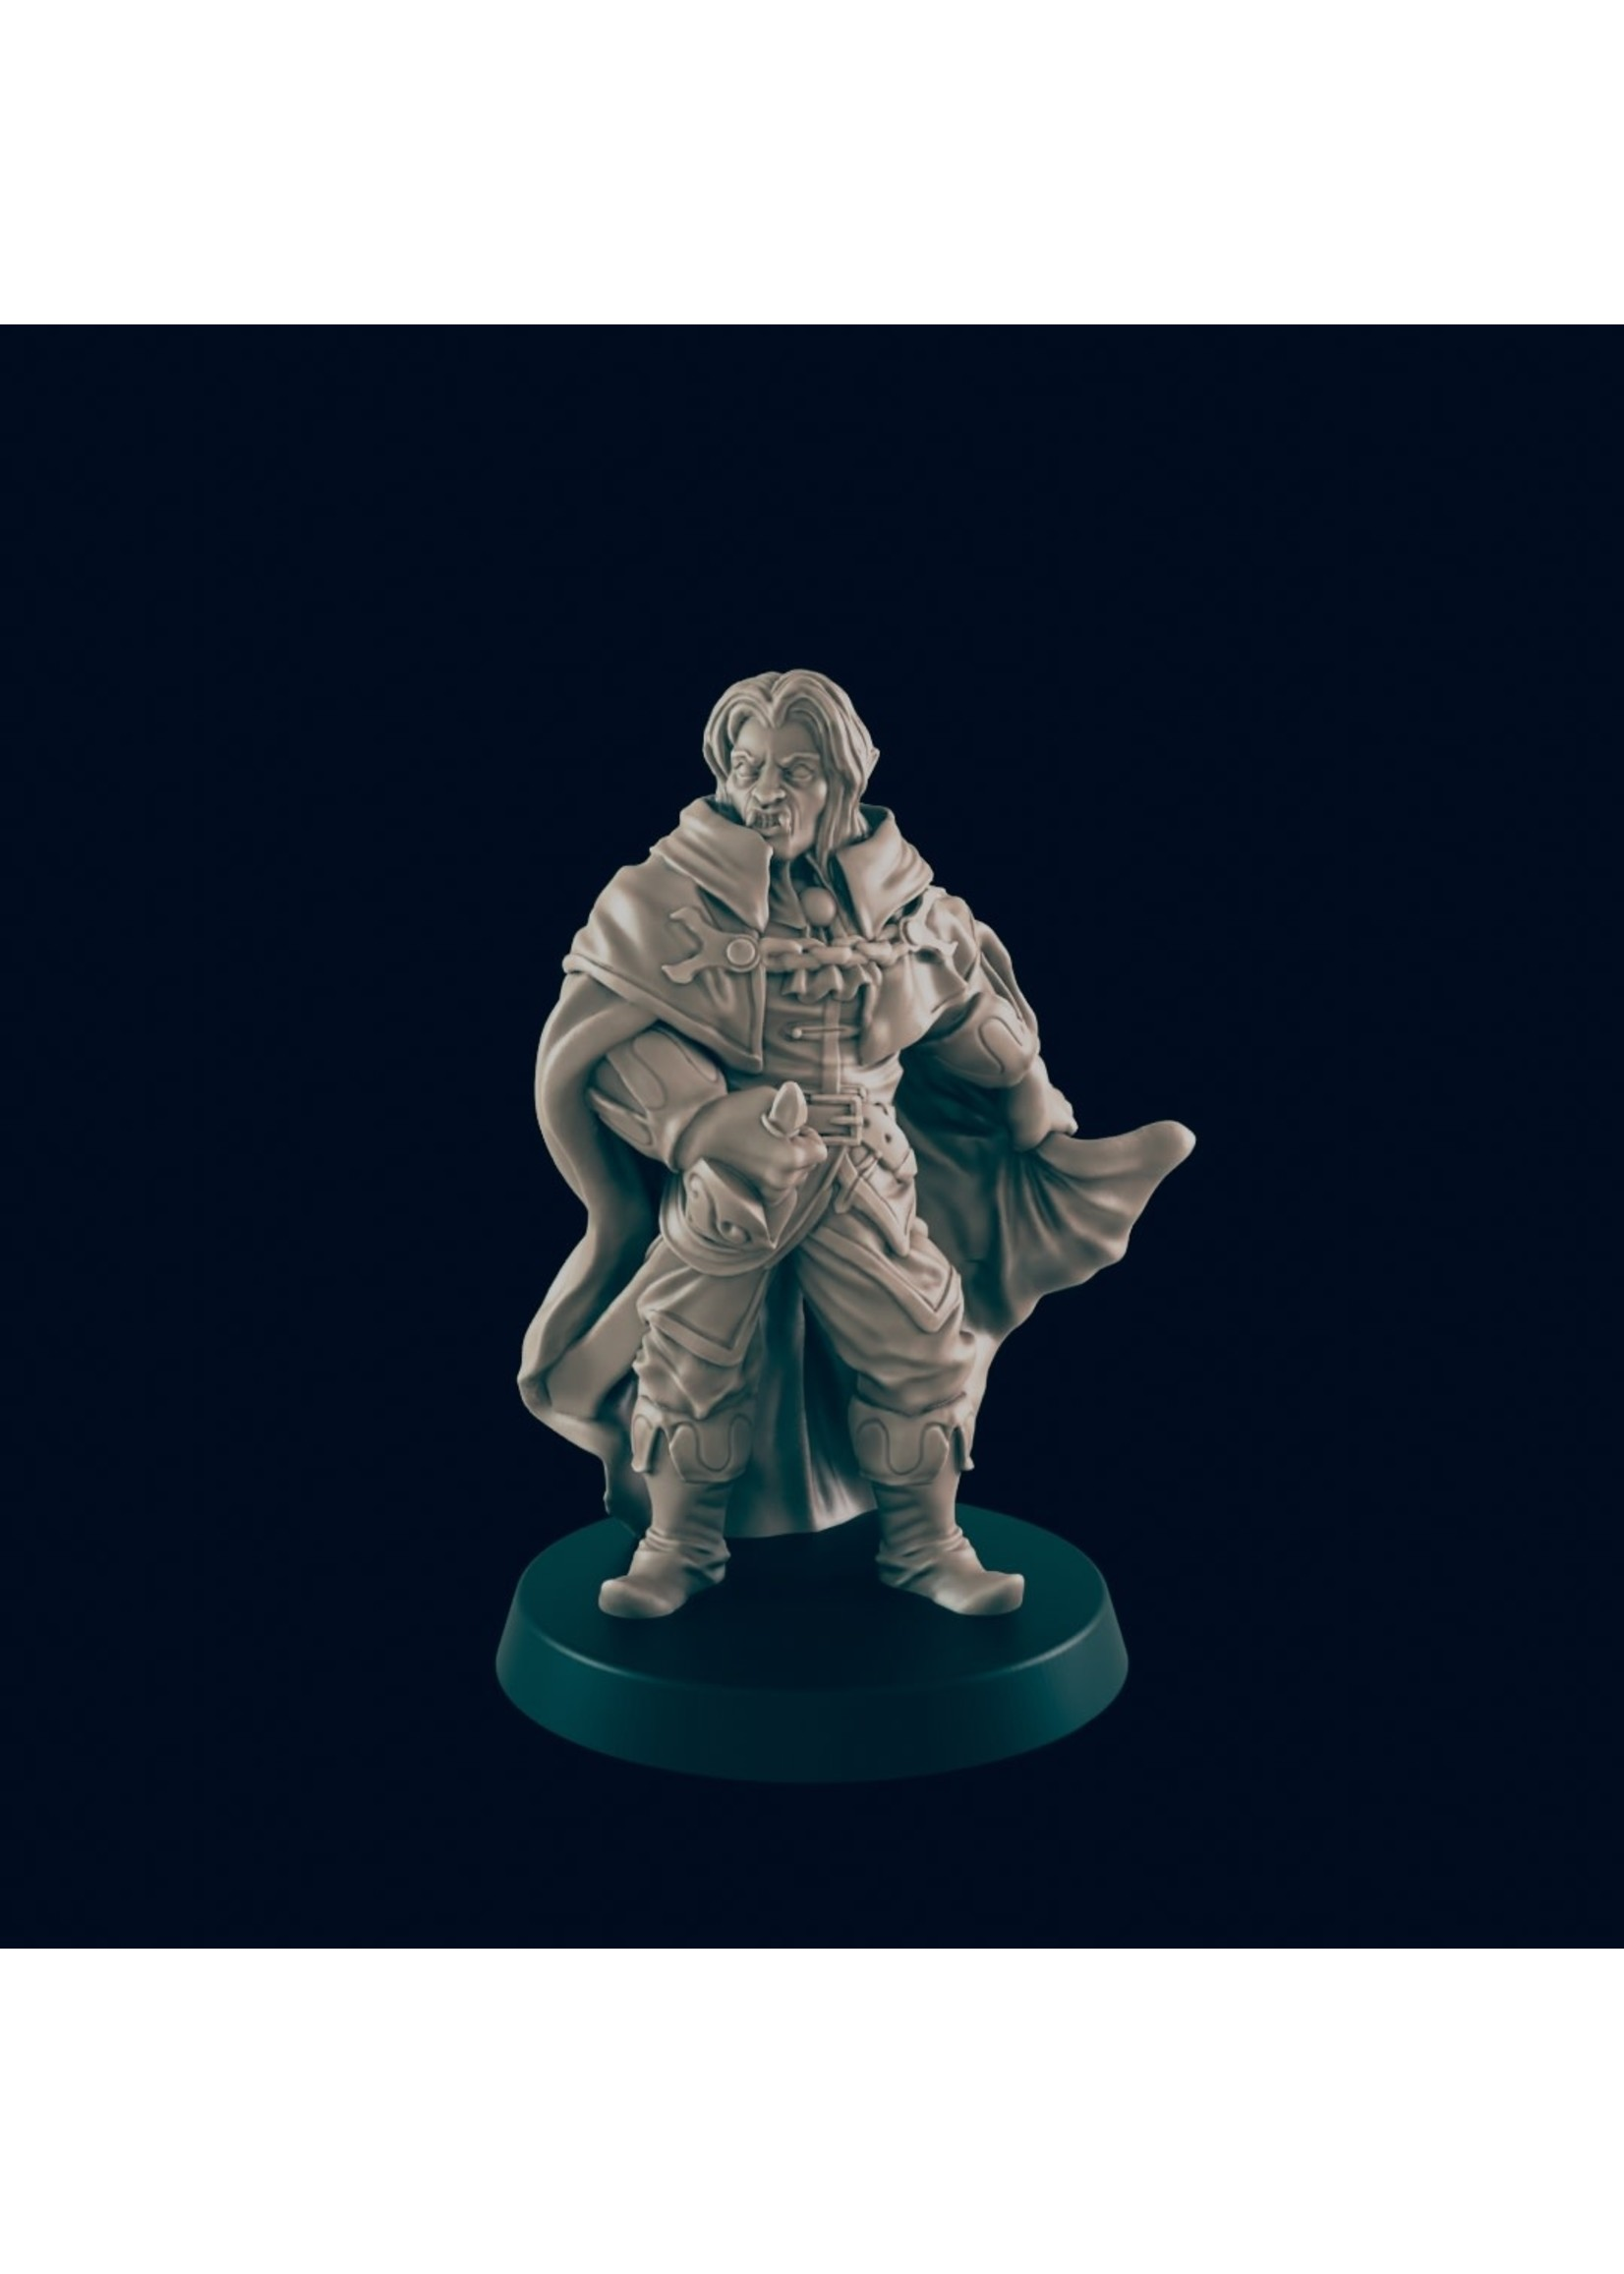 3D Printed Miniature - Male Vampire - Dungeons & Dragons - Beasts and Baddies KS